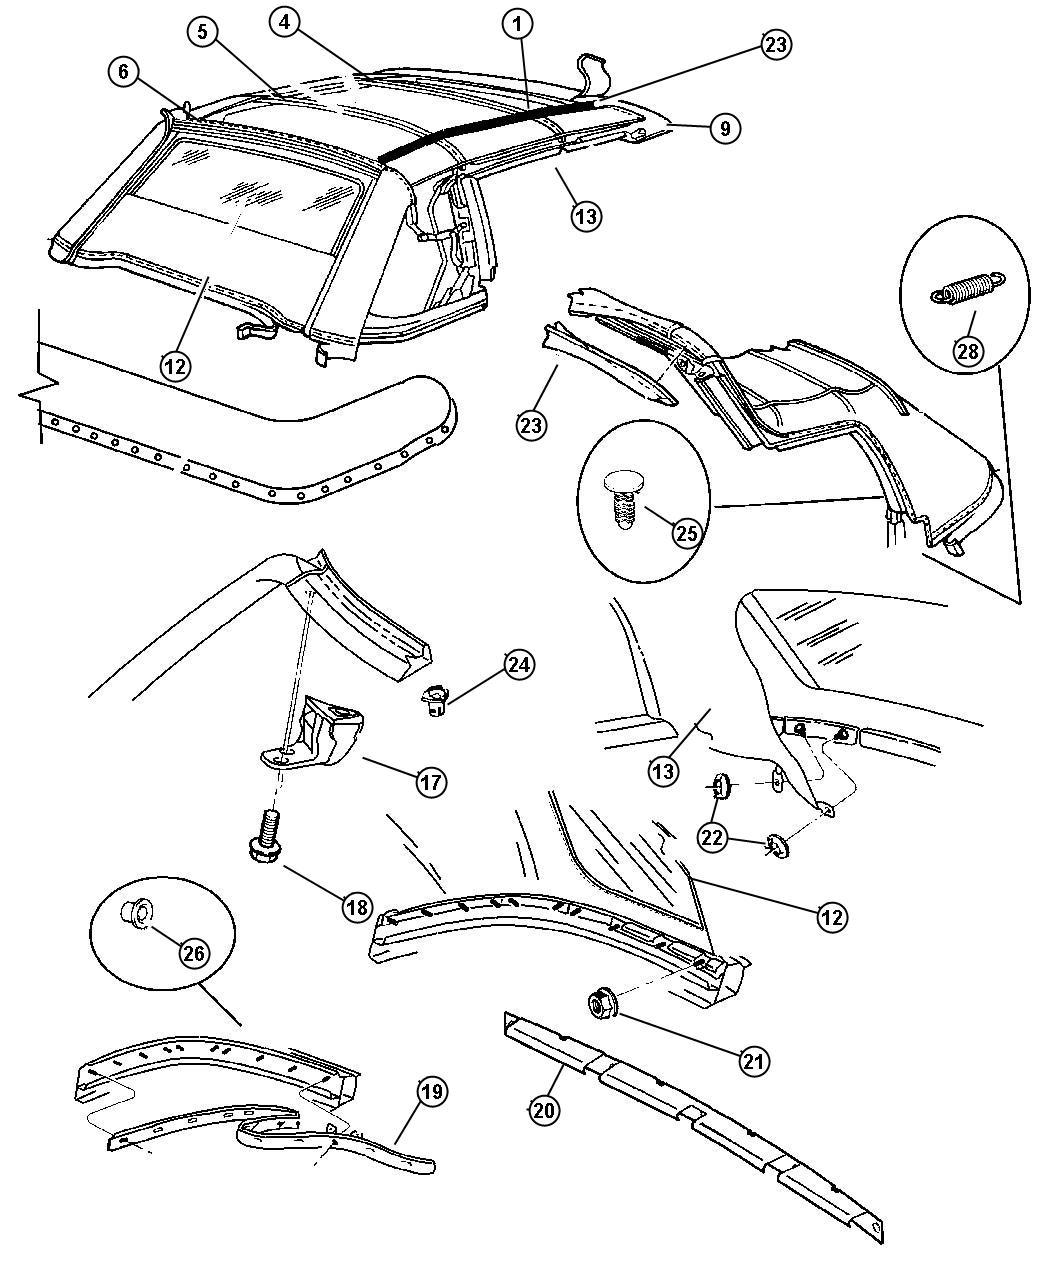 1997 chrysler sebring convertible wiring diagrams chrysler